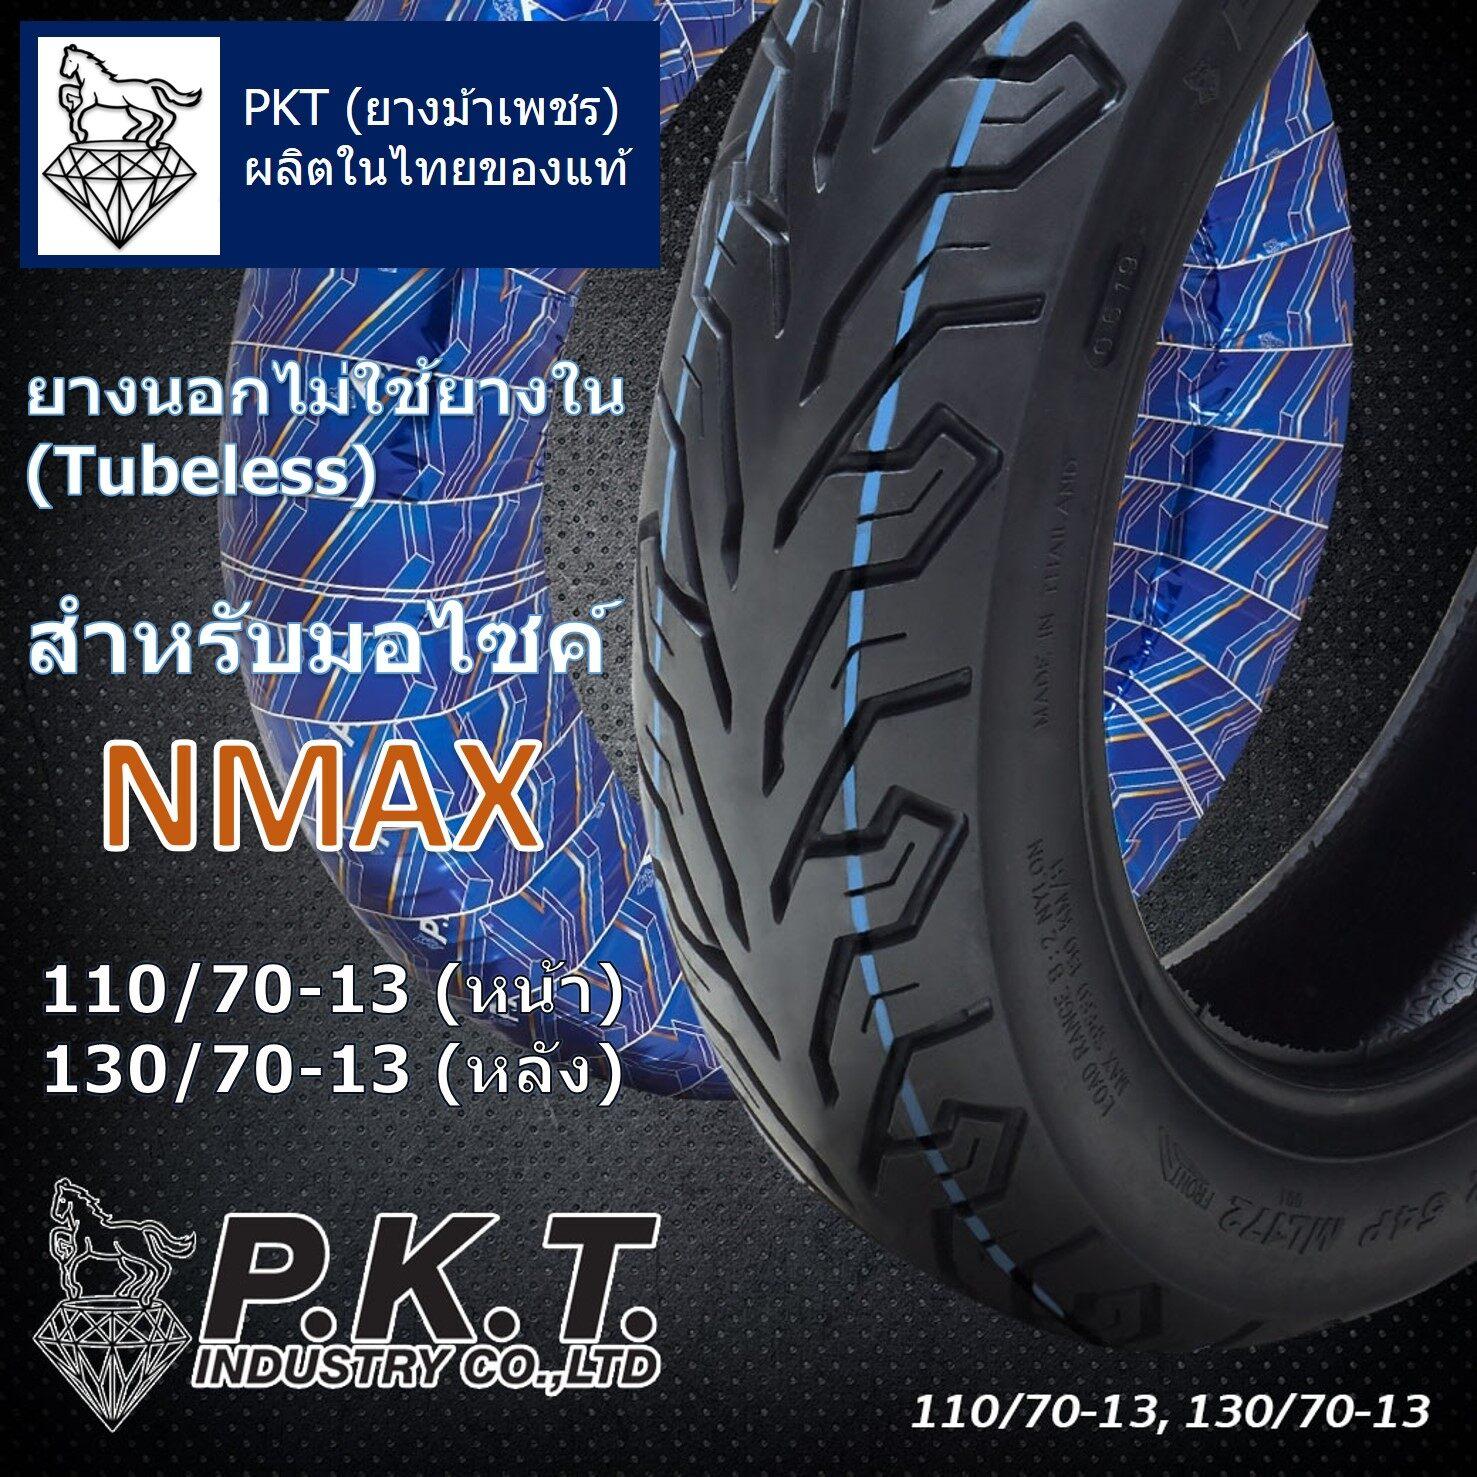 Pkt ยางนอกไม่ใช้ยางใน (tubeless) มอไซค์ Nmax ล้อหน้า-หลัง 110/70-13 และ 130/70-13 ยางตราม้าเพชร ผลิตในไทยของแท้.